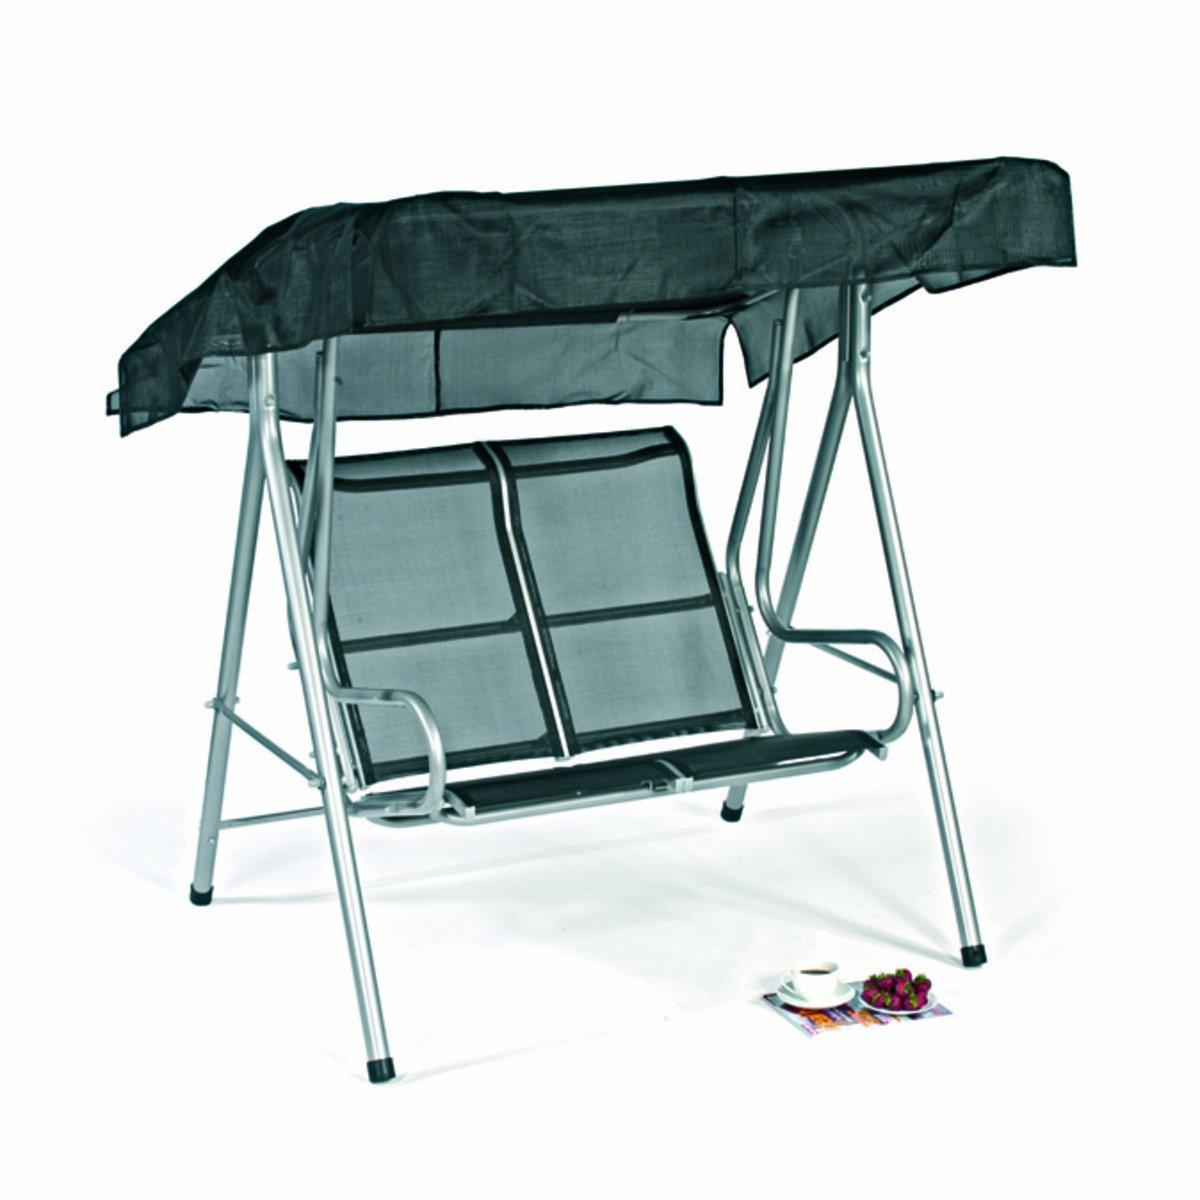 bosmere c500 2 seat hammock cover  amazon co uk  garden  u0026 outdoors  rh   amazon co uk